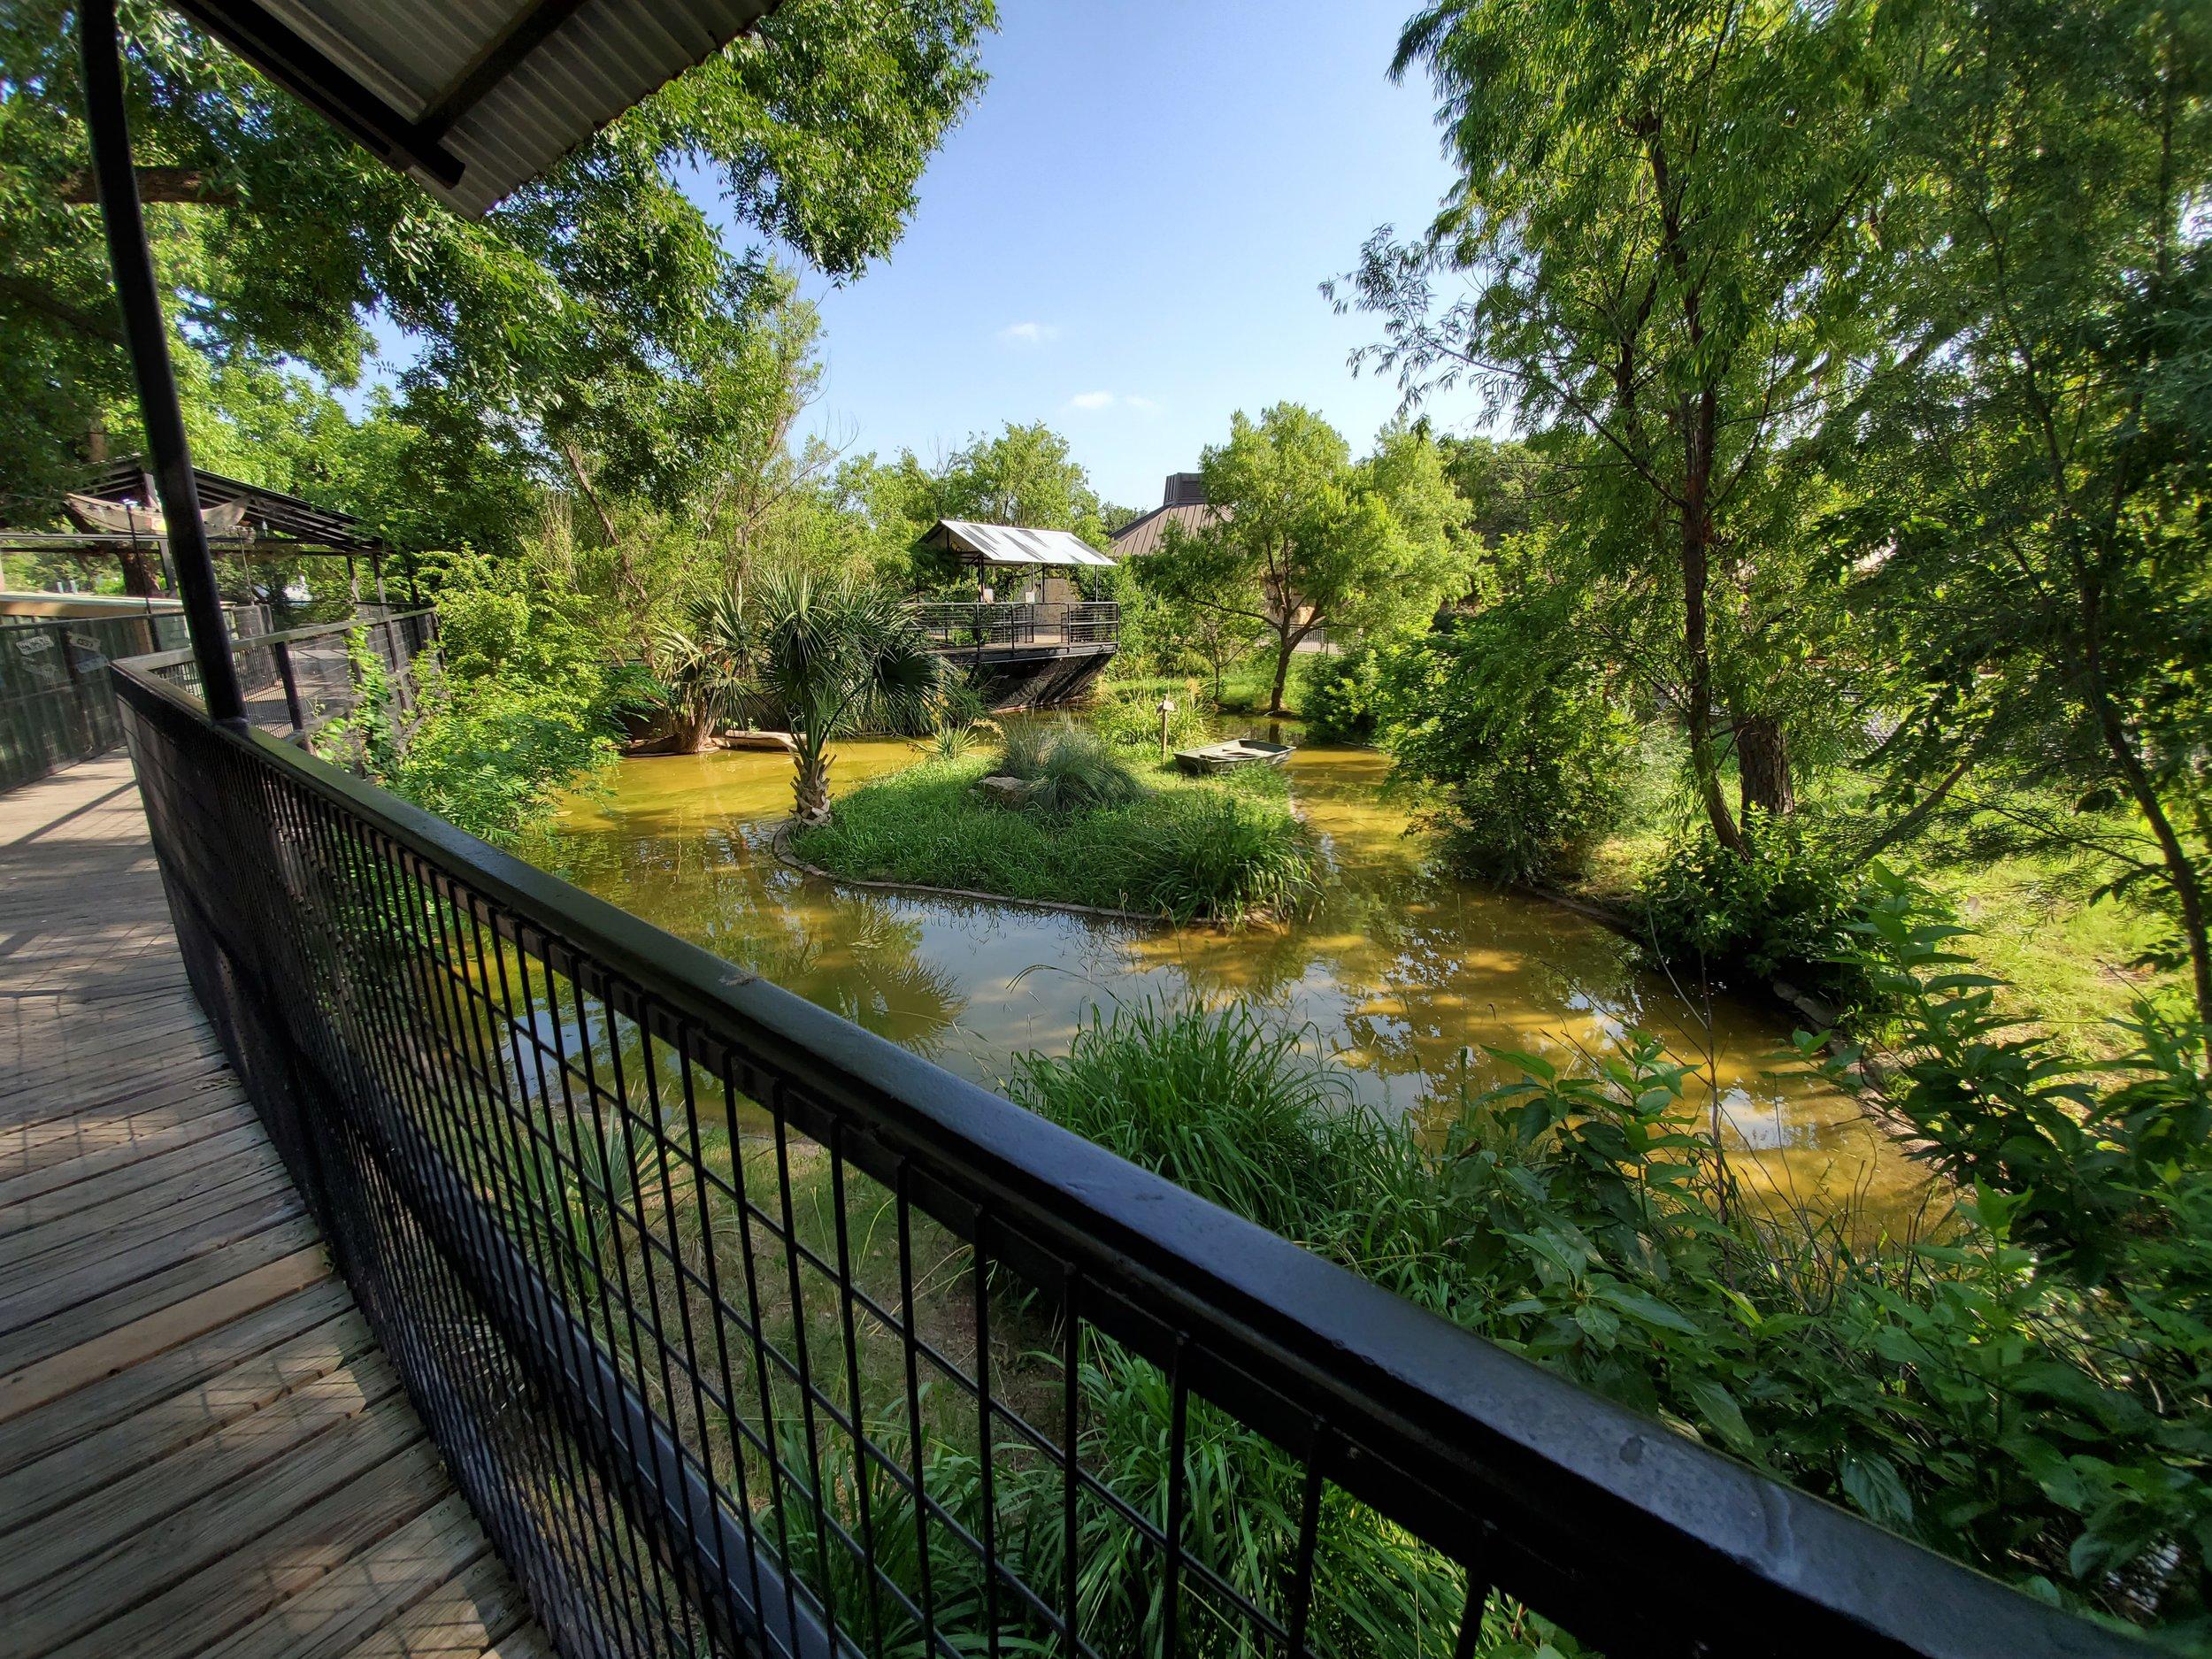 Huge habitat for gator